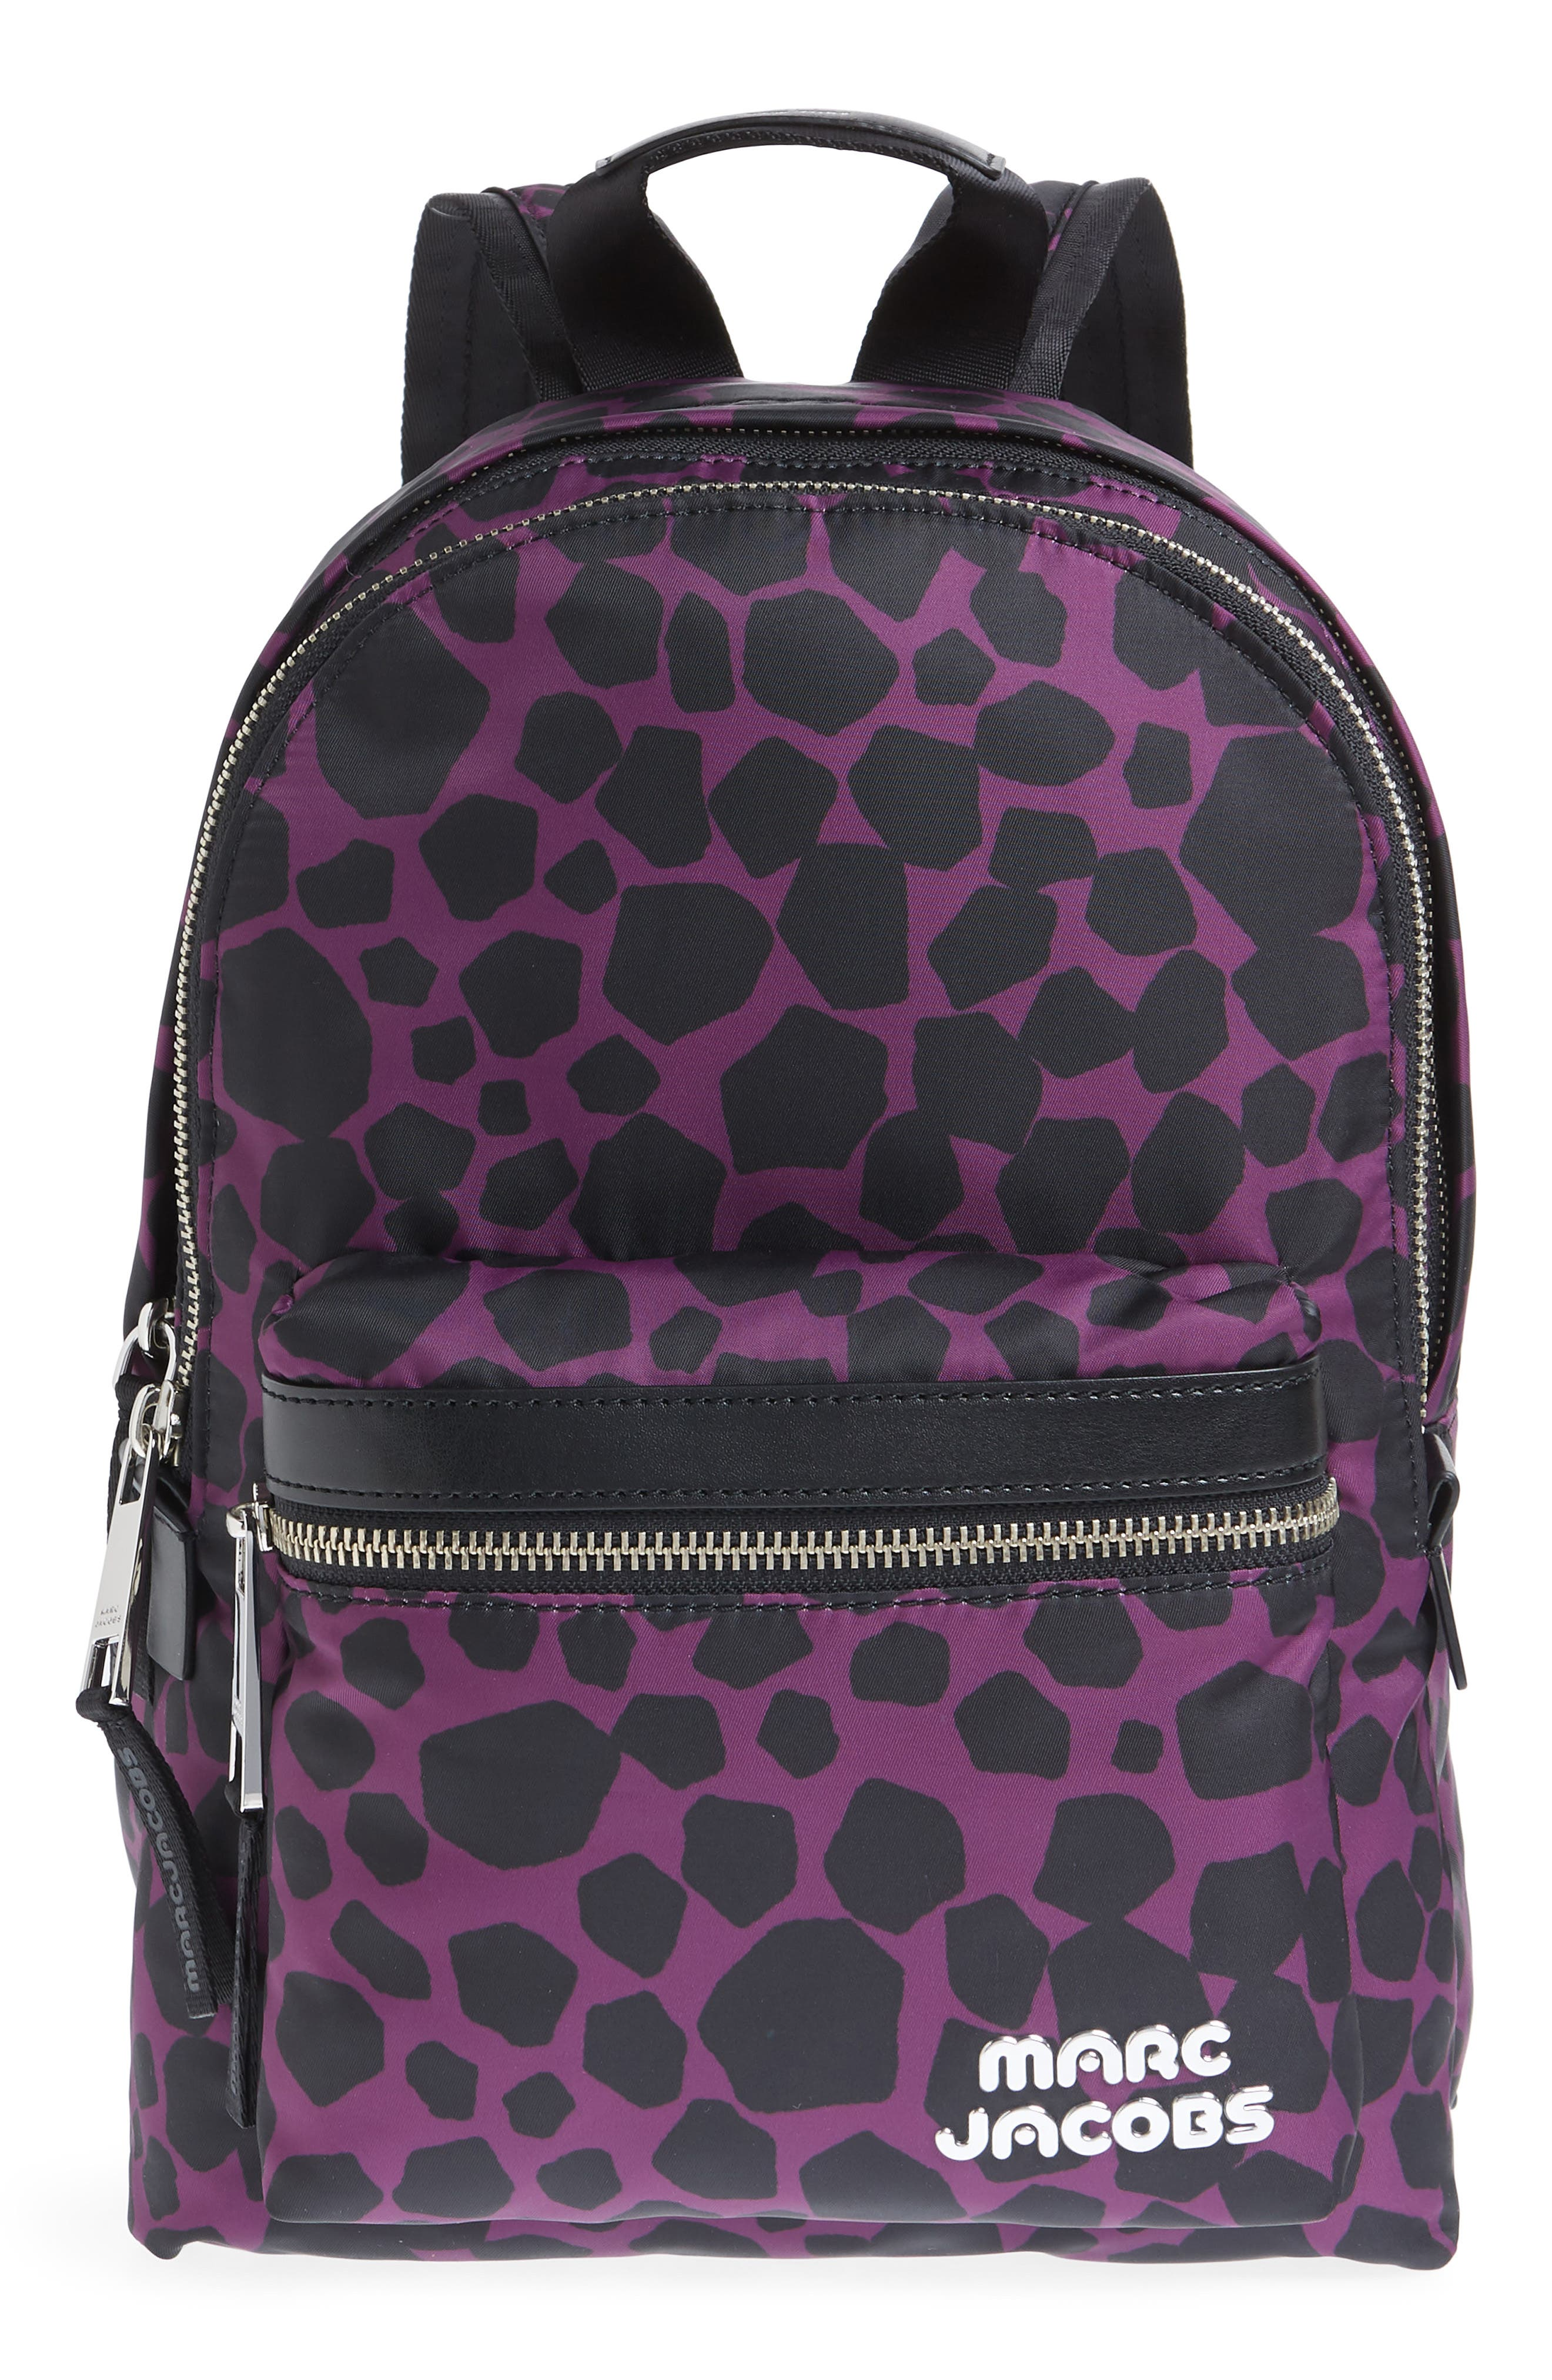 Medium Trek Pack Pebbles Backpack,                             Main thumbnail 1, color,                             BERRY MULTI